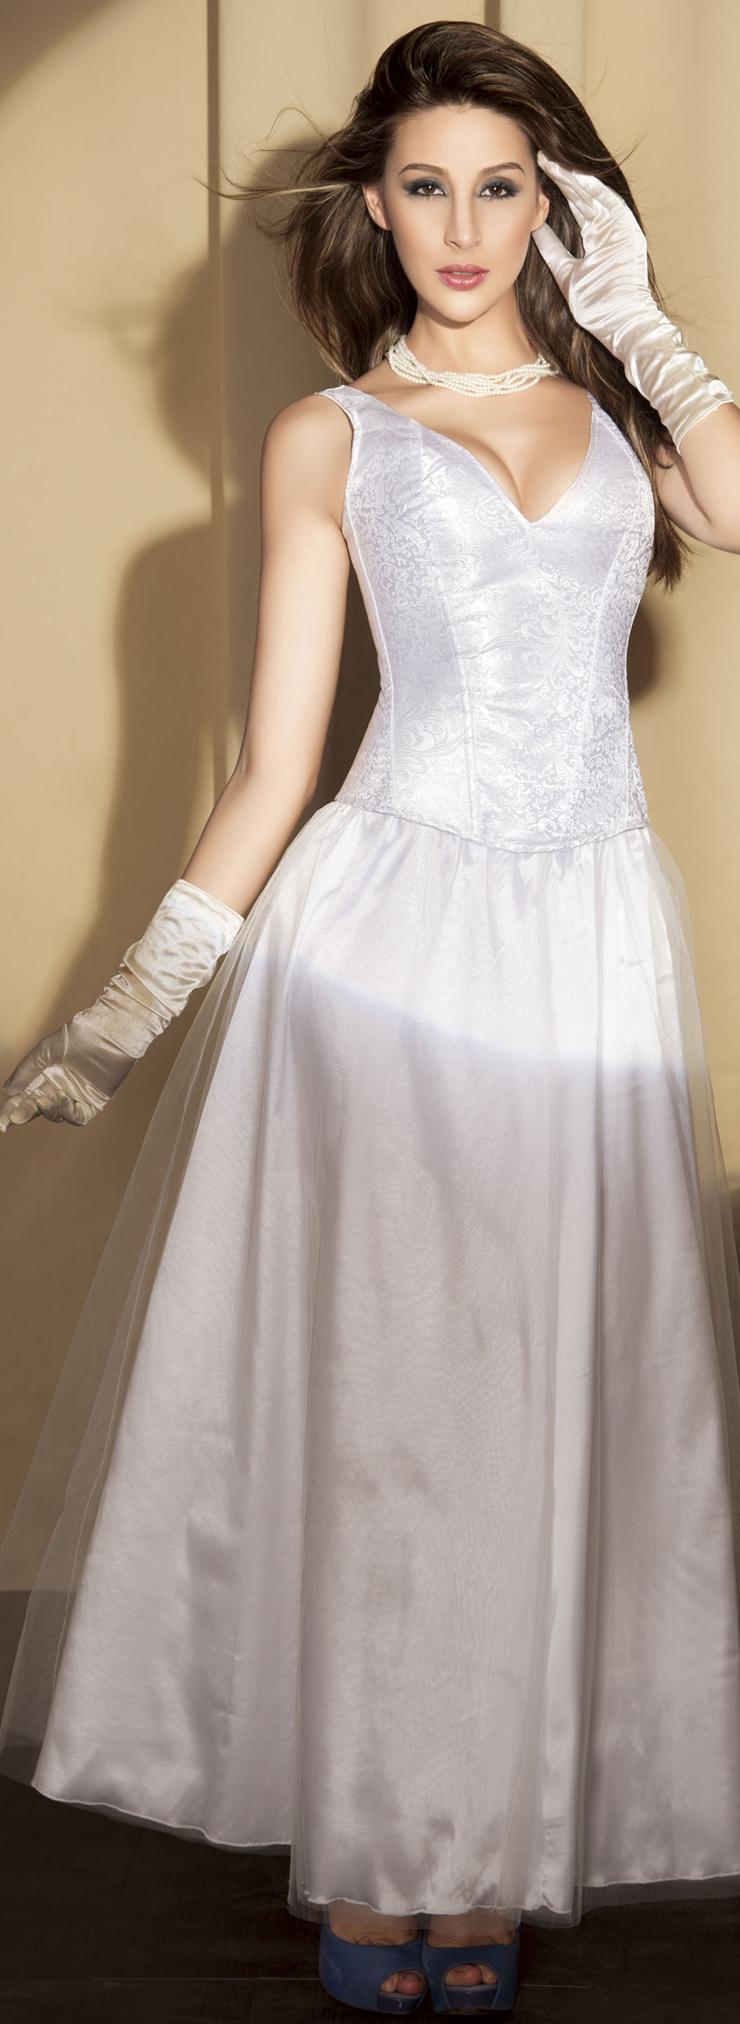 Full-Back Corset, White Brocade Corset, Brocade Bride Corset, #N5064